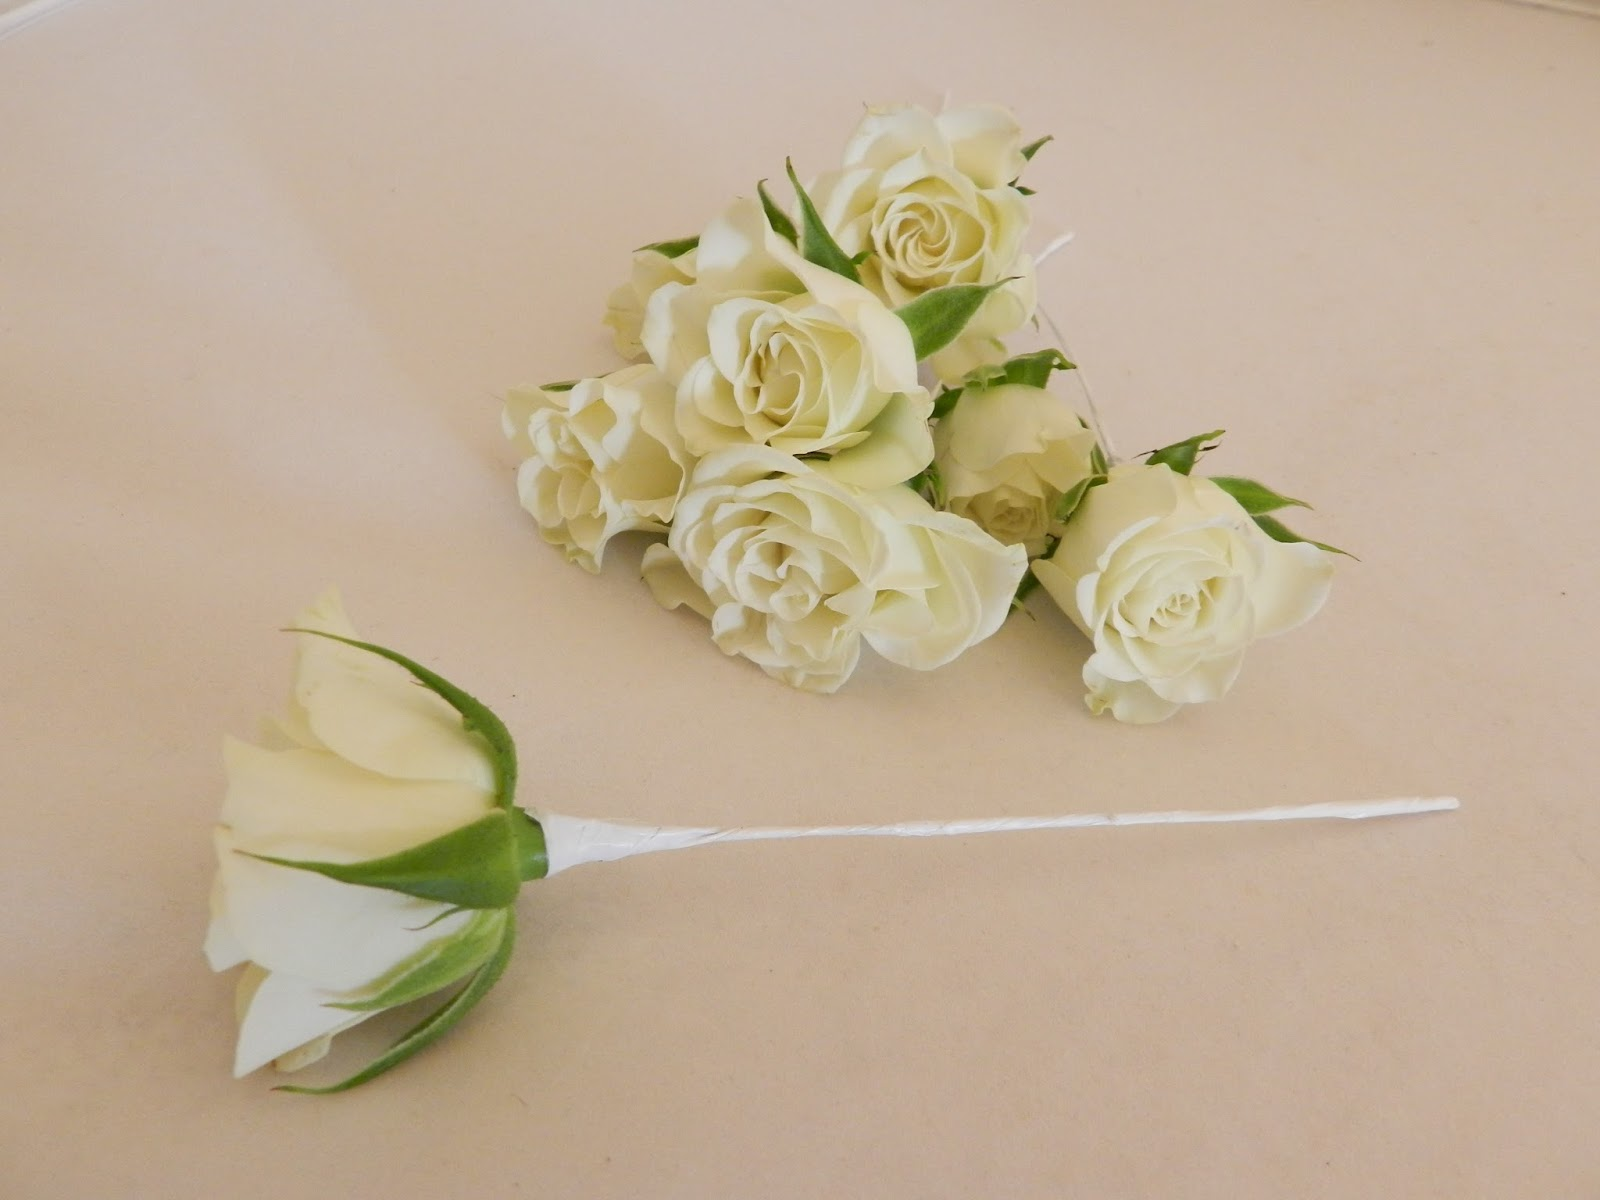 Sandras Flower Studio White And Ivory Wedding Flowers